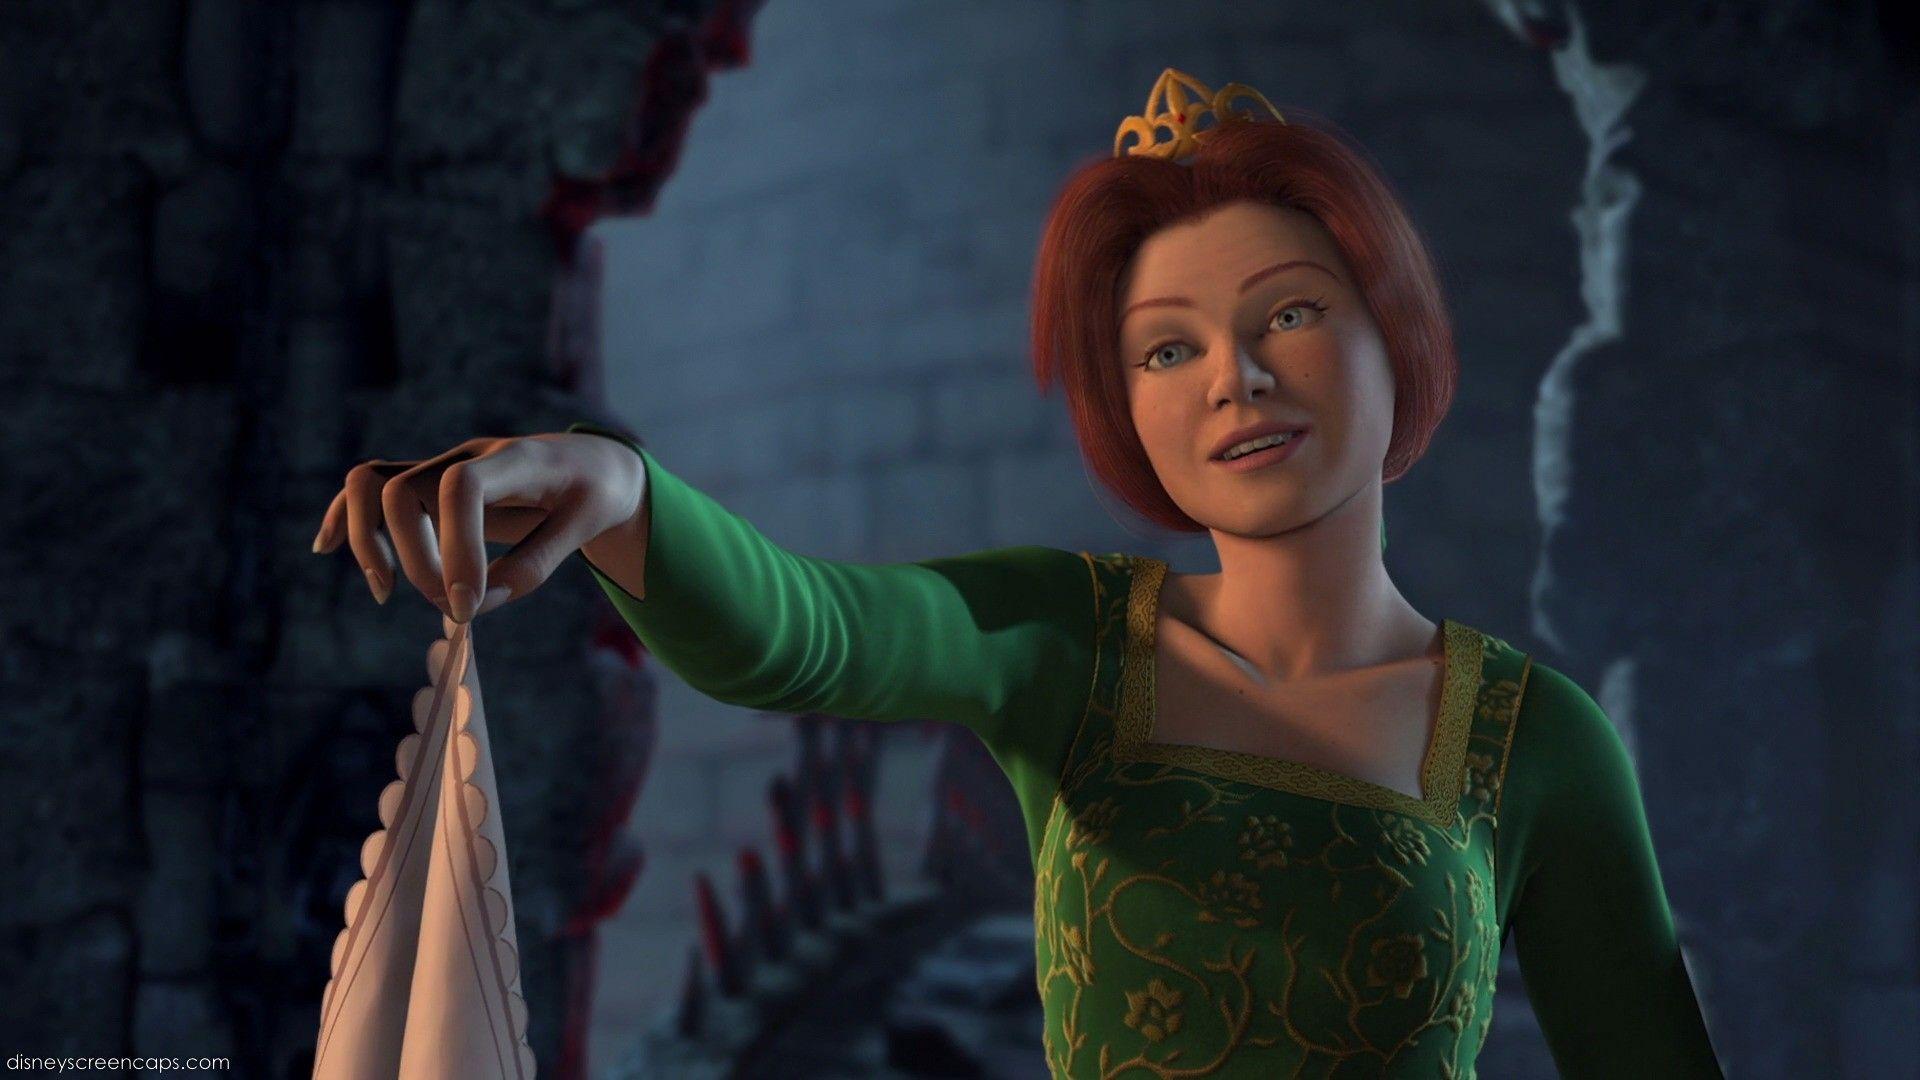 shrek and fiona - Google Search | ♥ DreamWorks ...